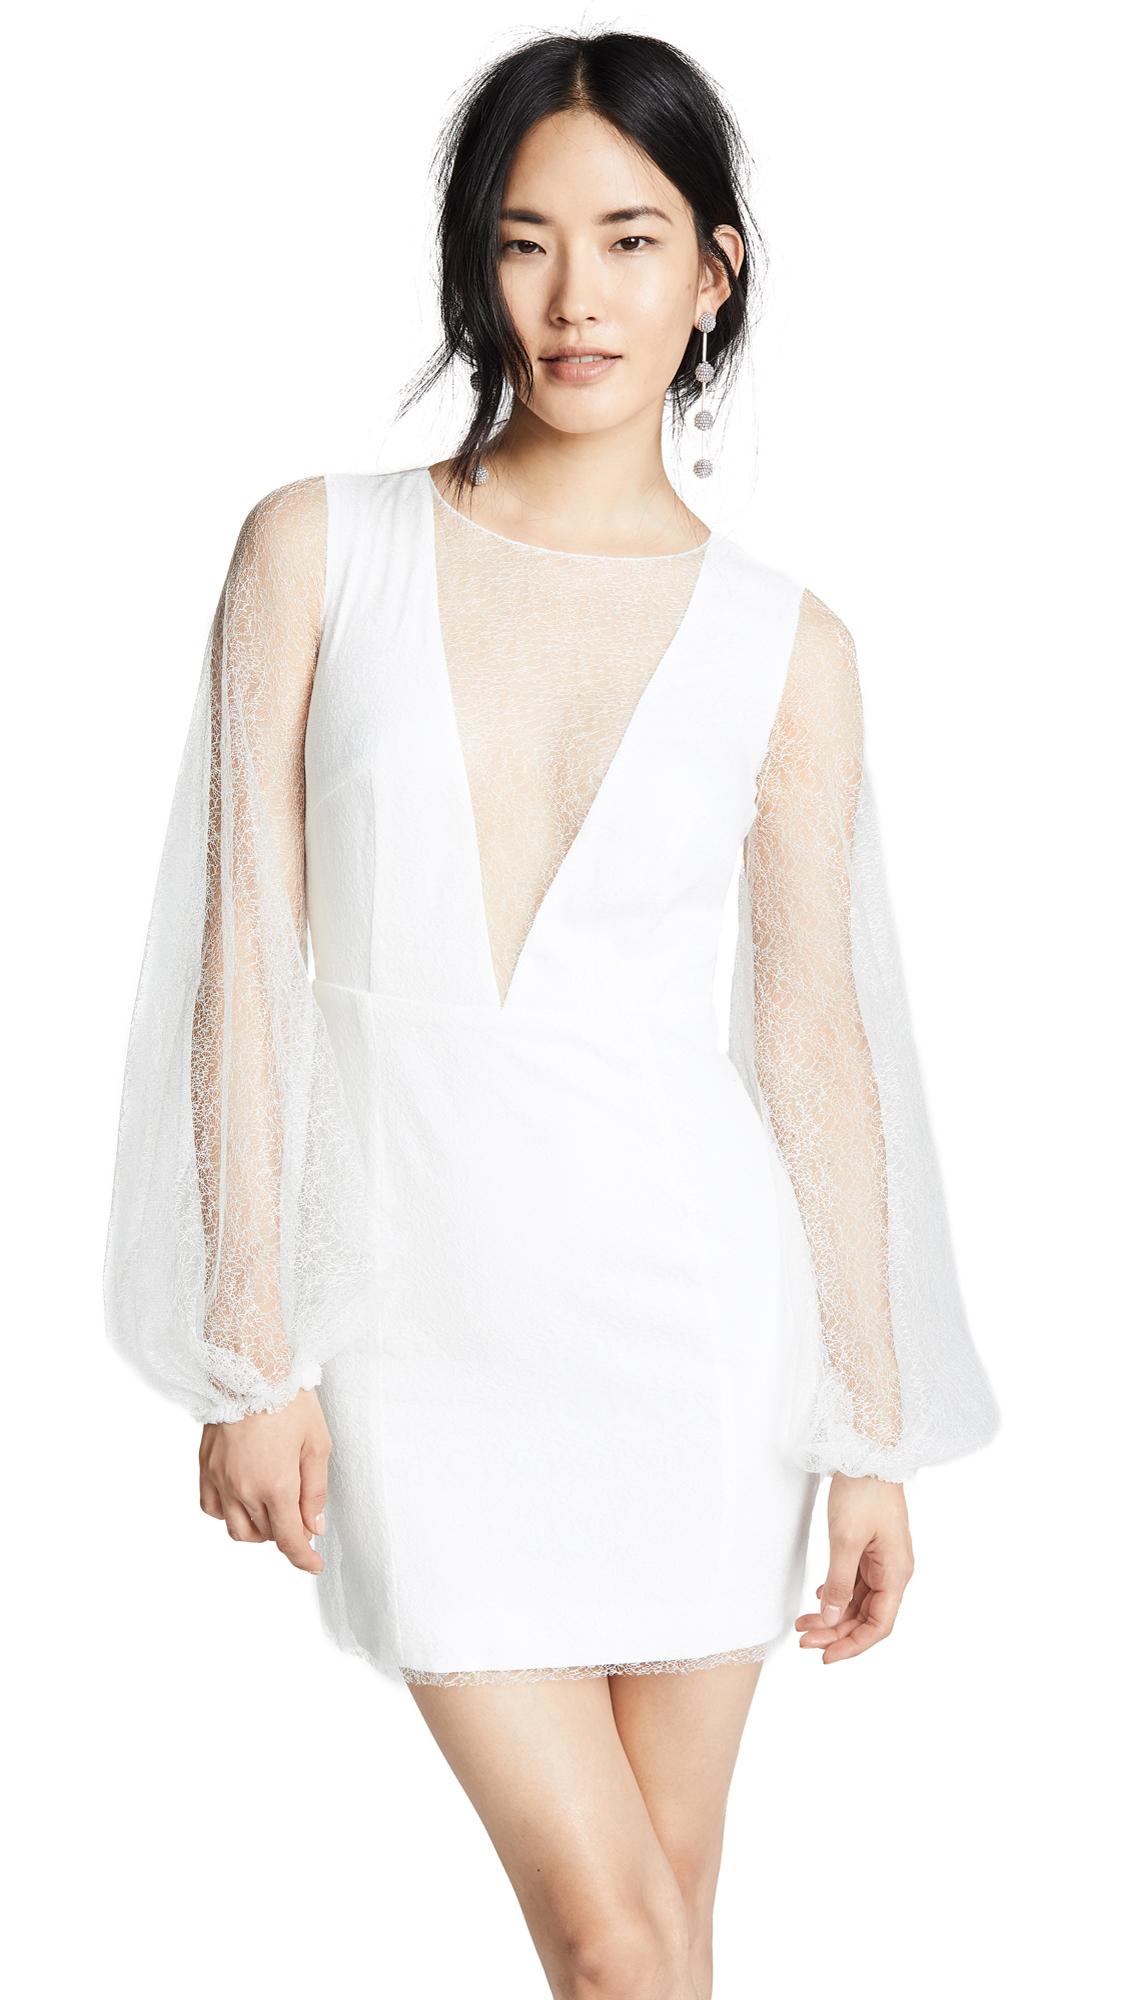 RIME ARODAKY Del Ray Dress With Balloon Sleeves in White